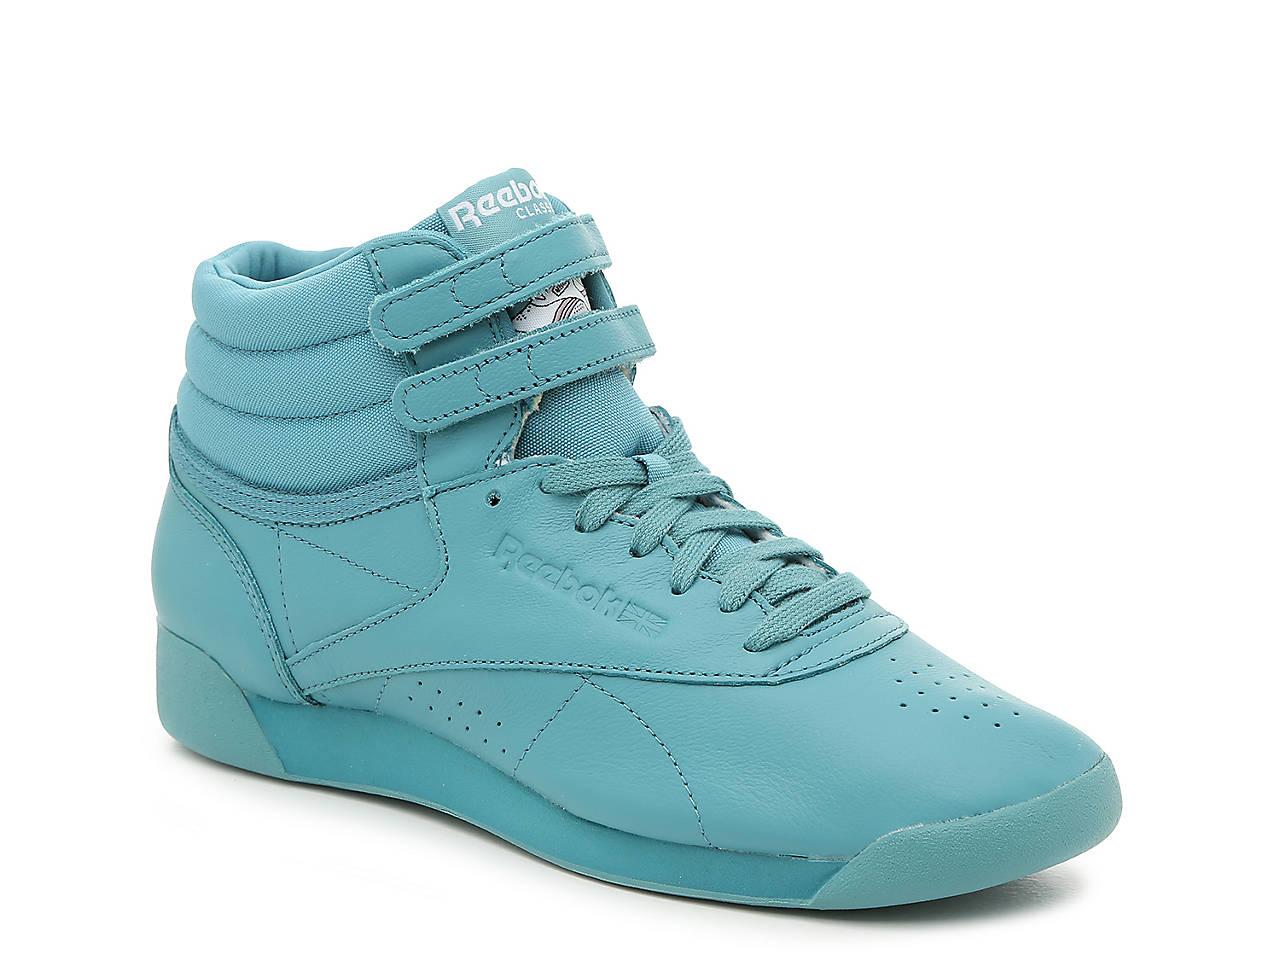 e19f5bea Freestyle Hi High-Top Sneaker - Women's